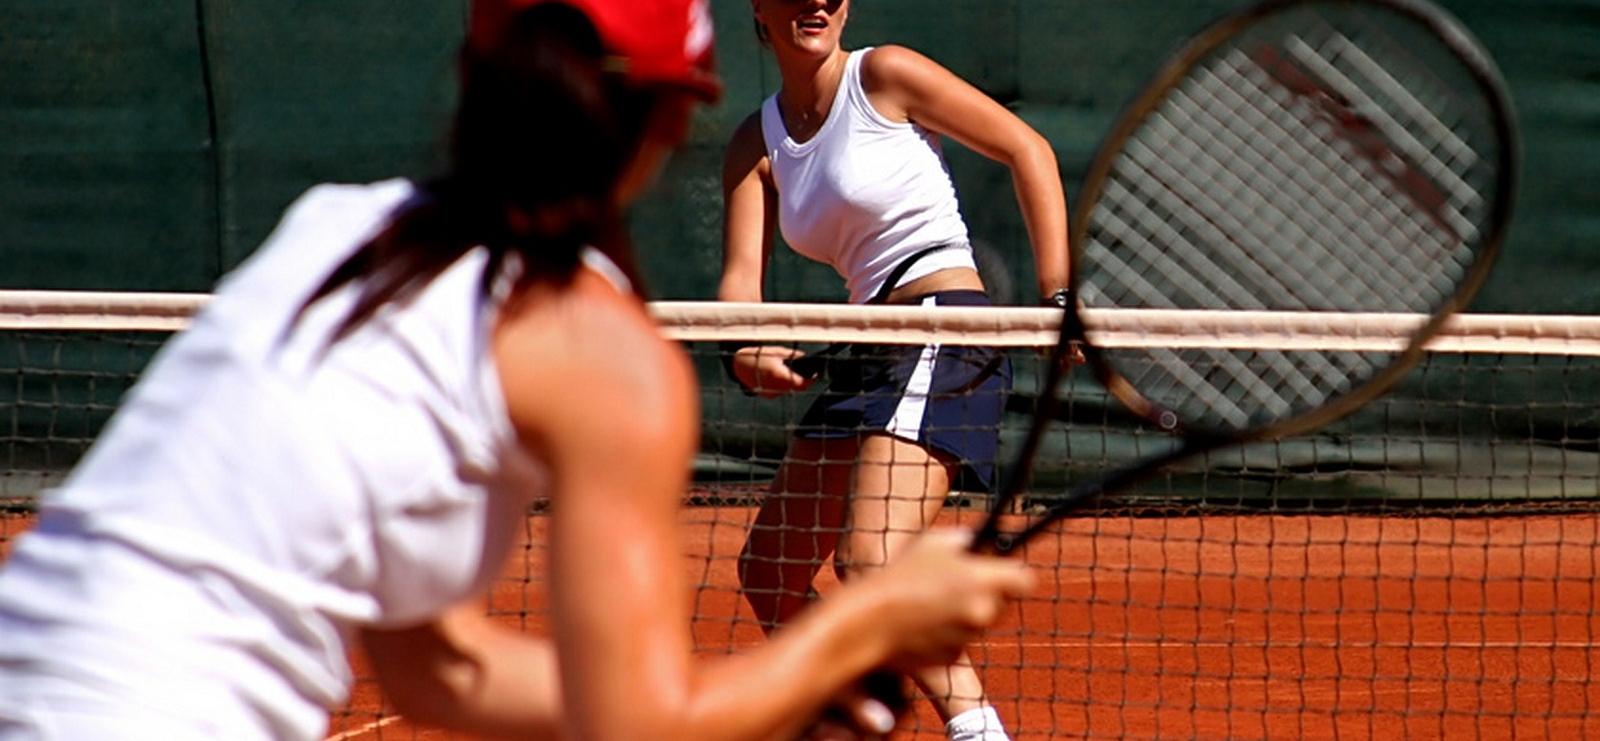 Tennis Puget